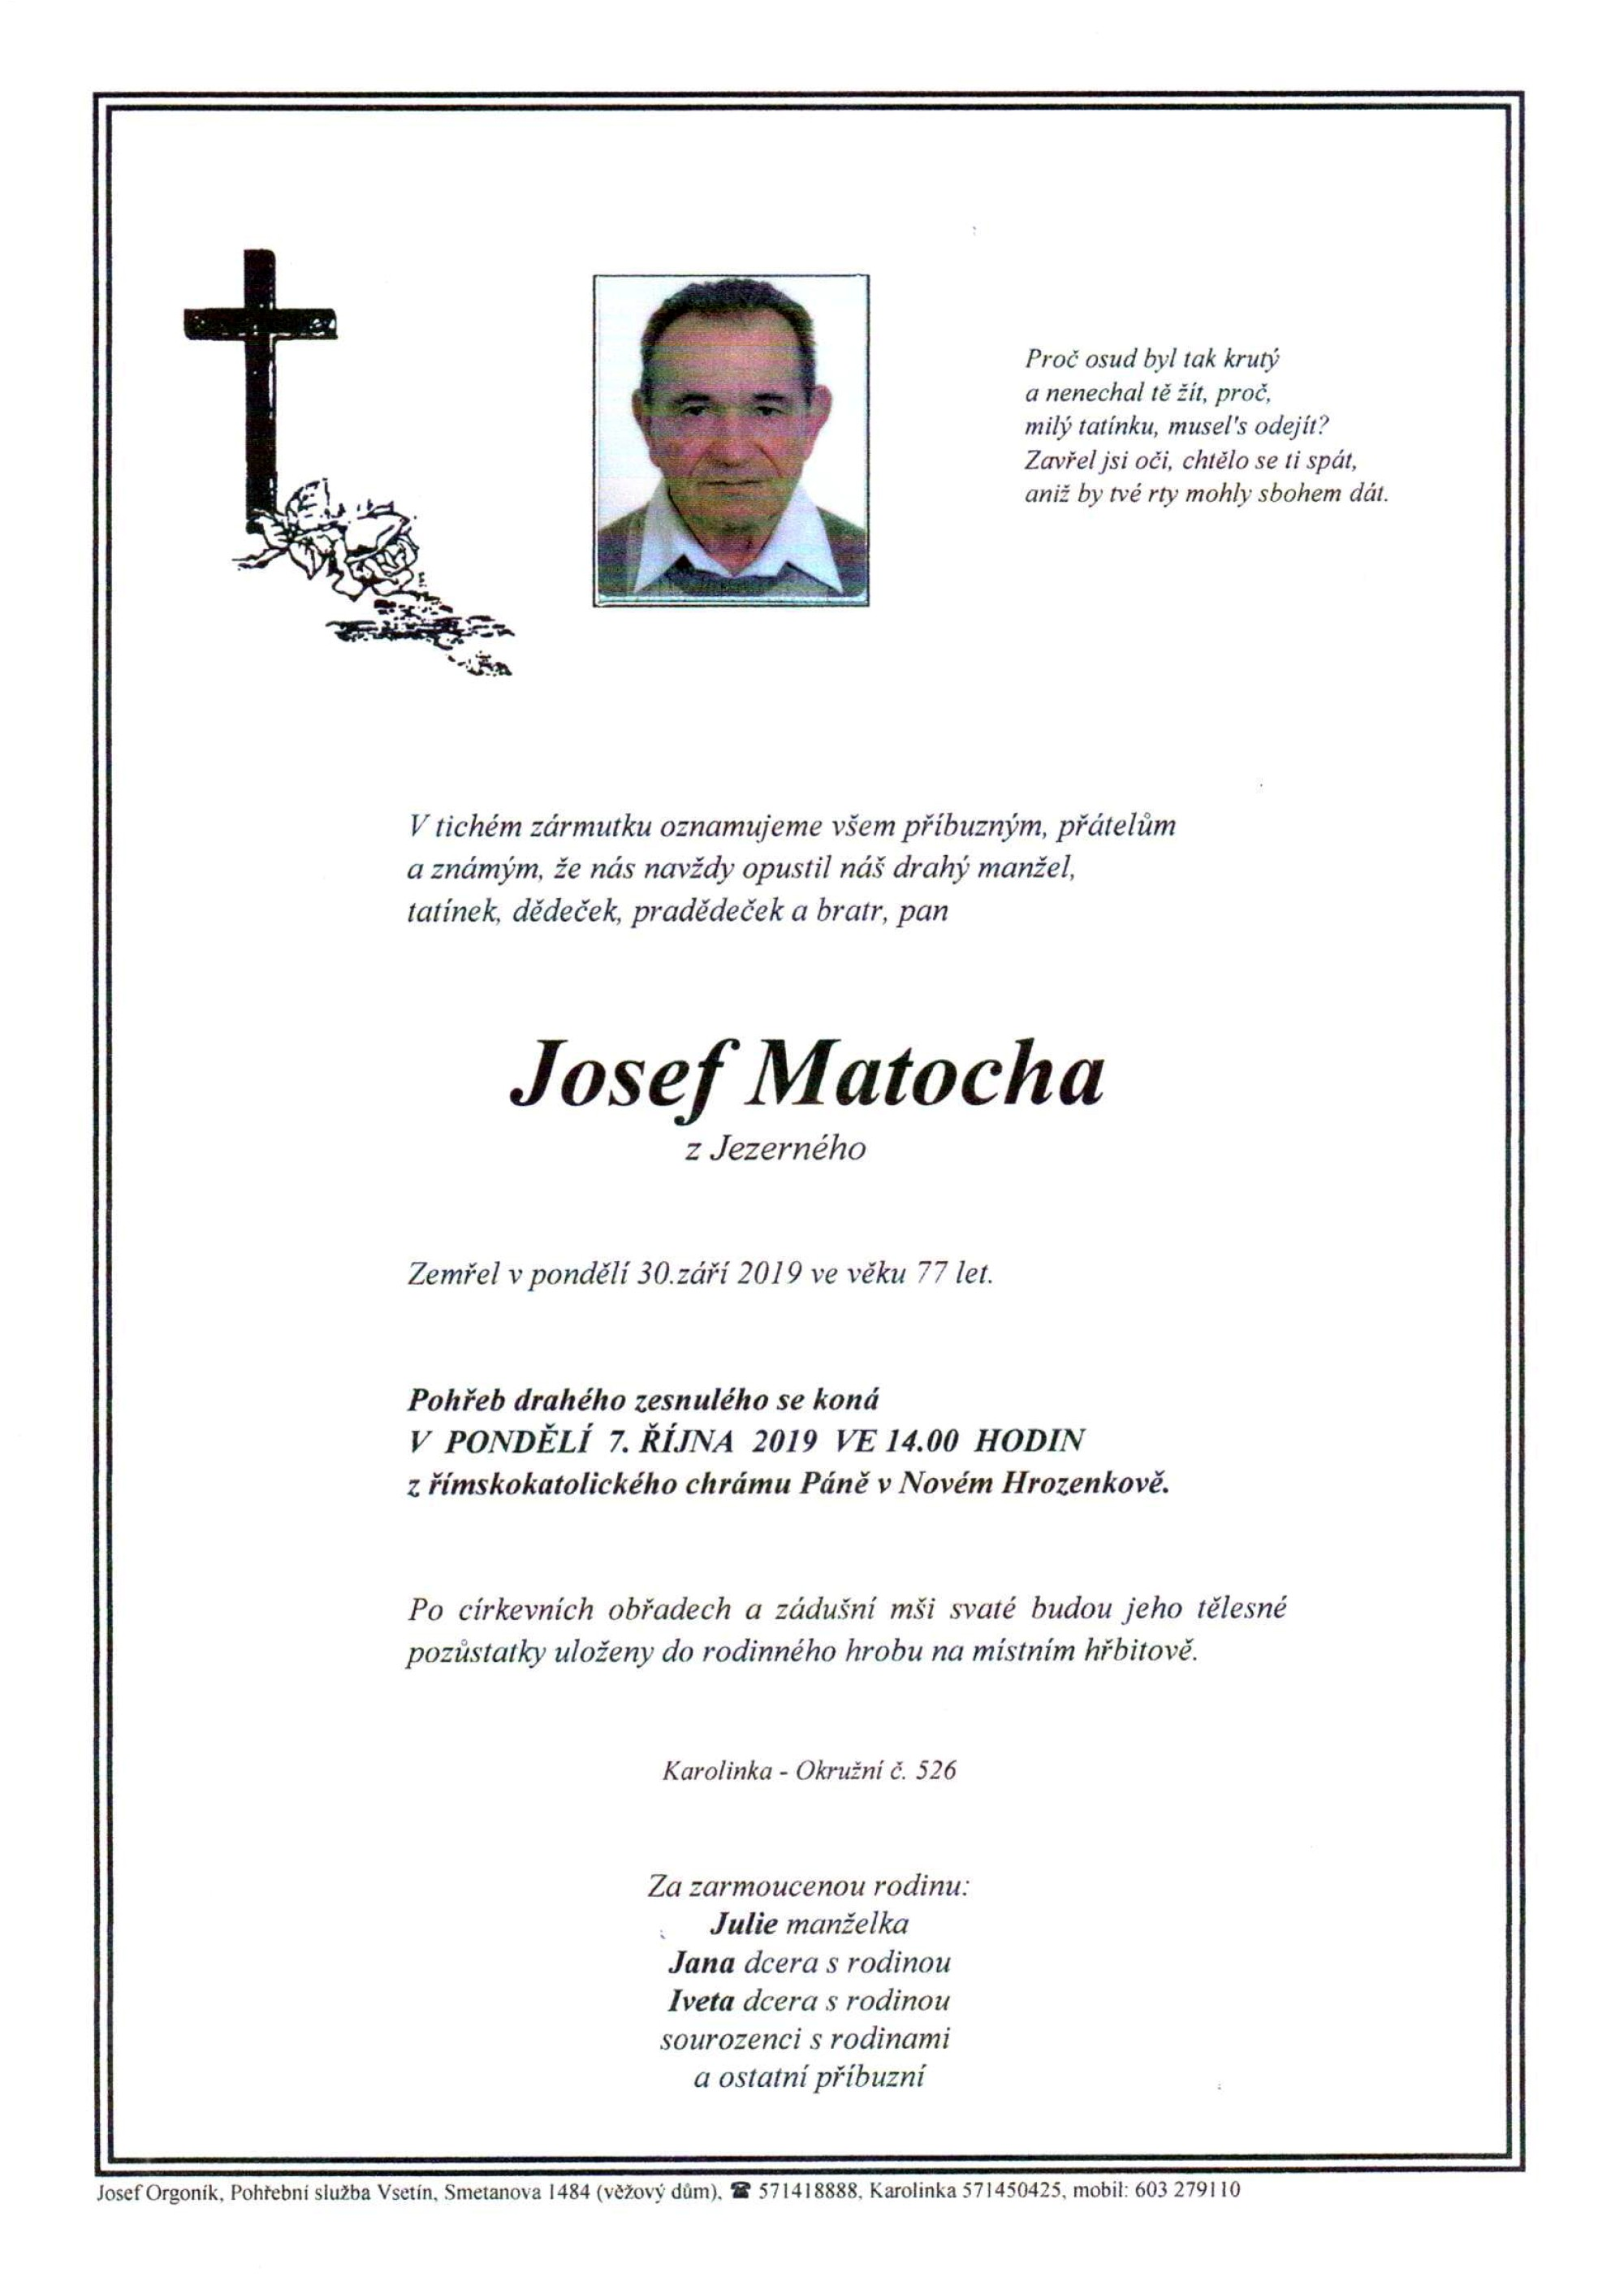 Josef Matocha